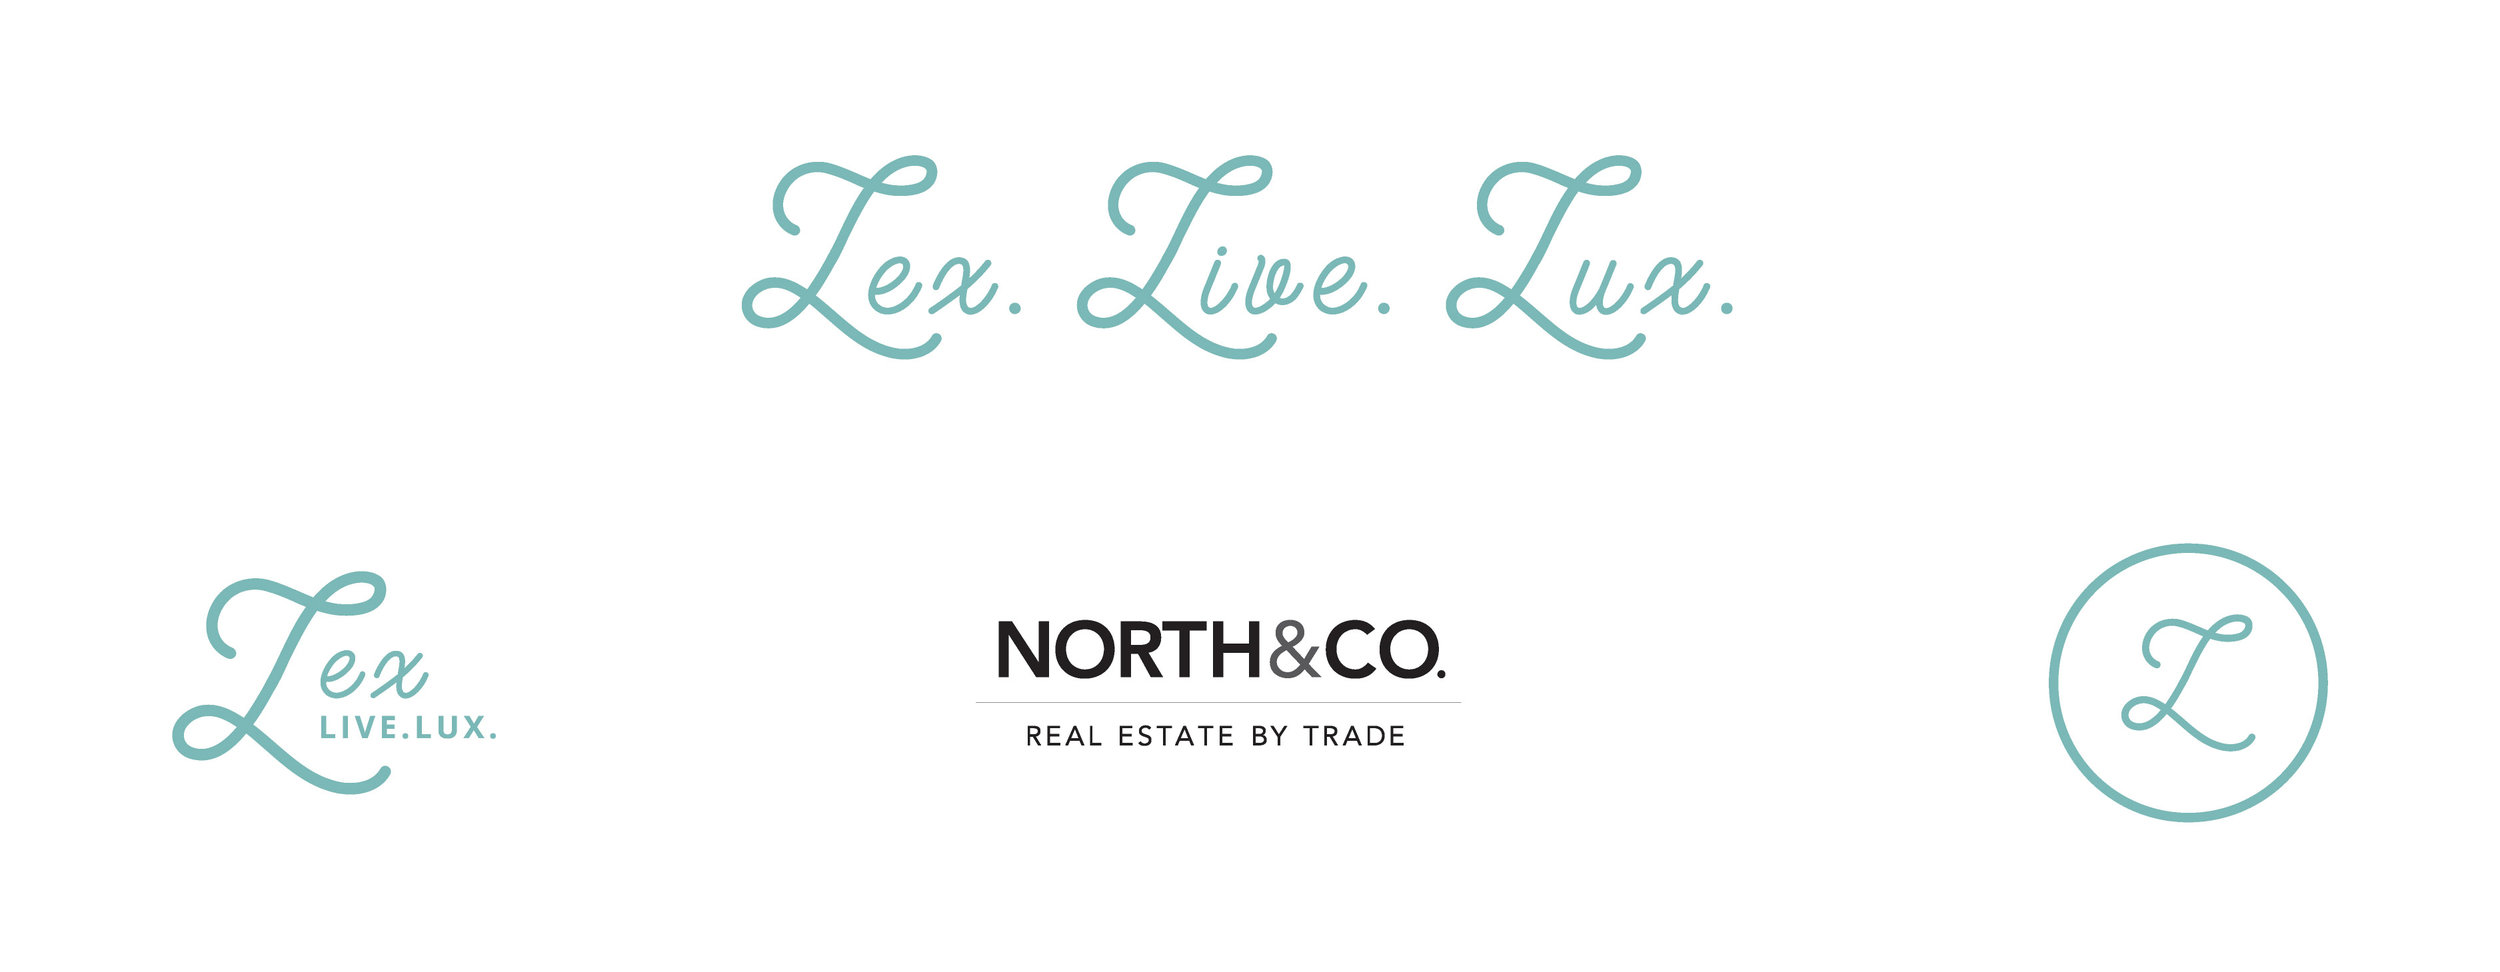 Luxury Real Estate Brand Identity Design.jpg